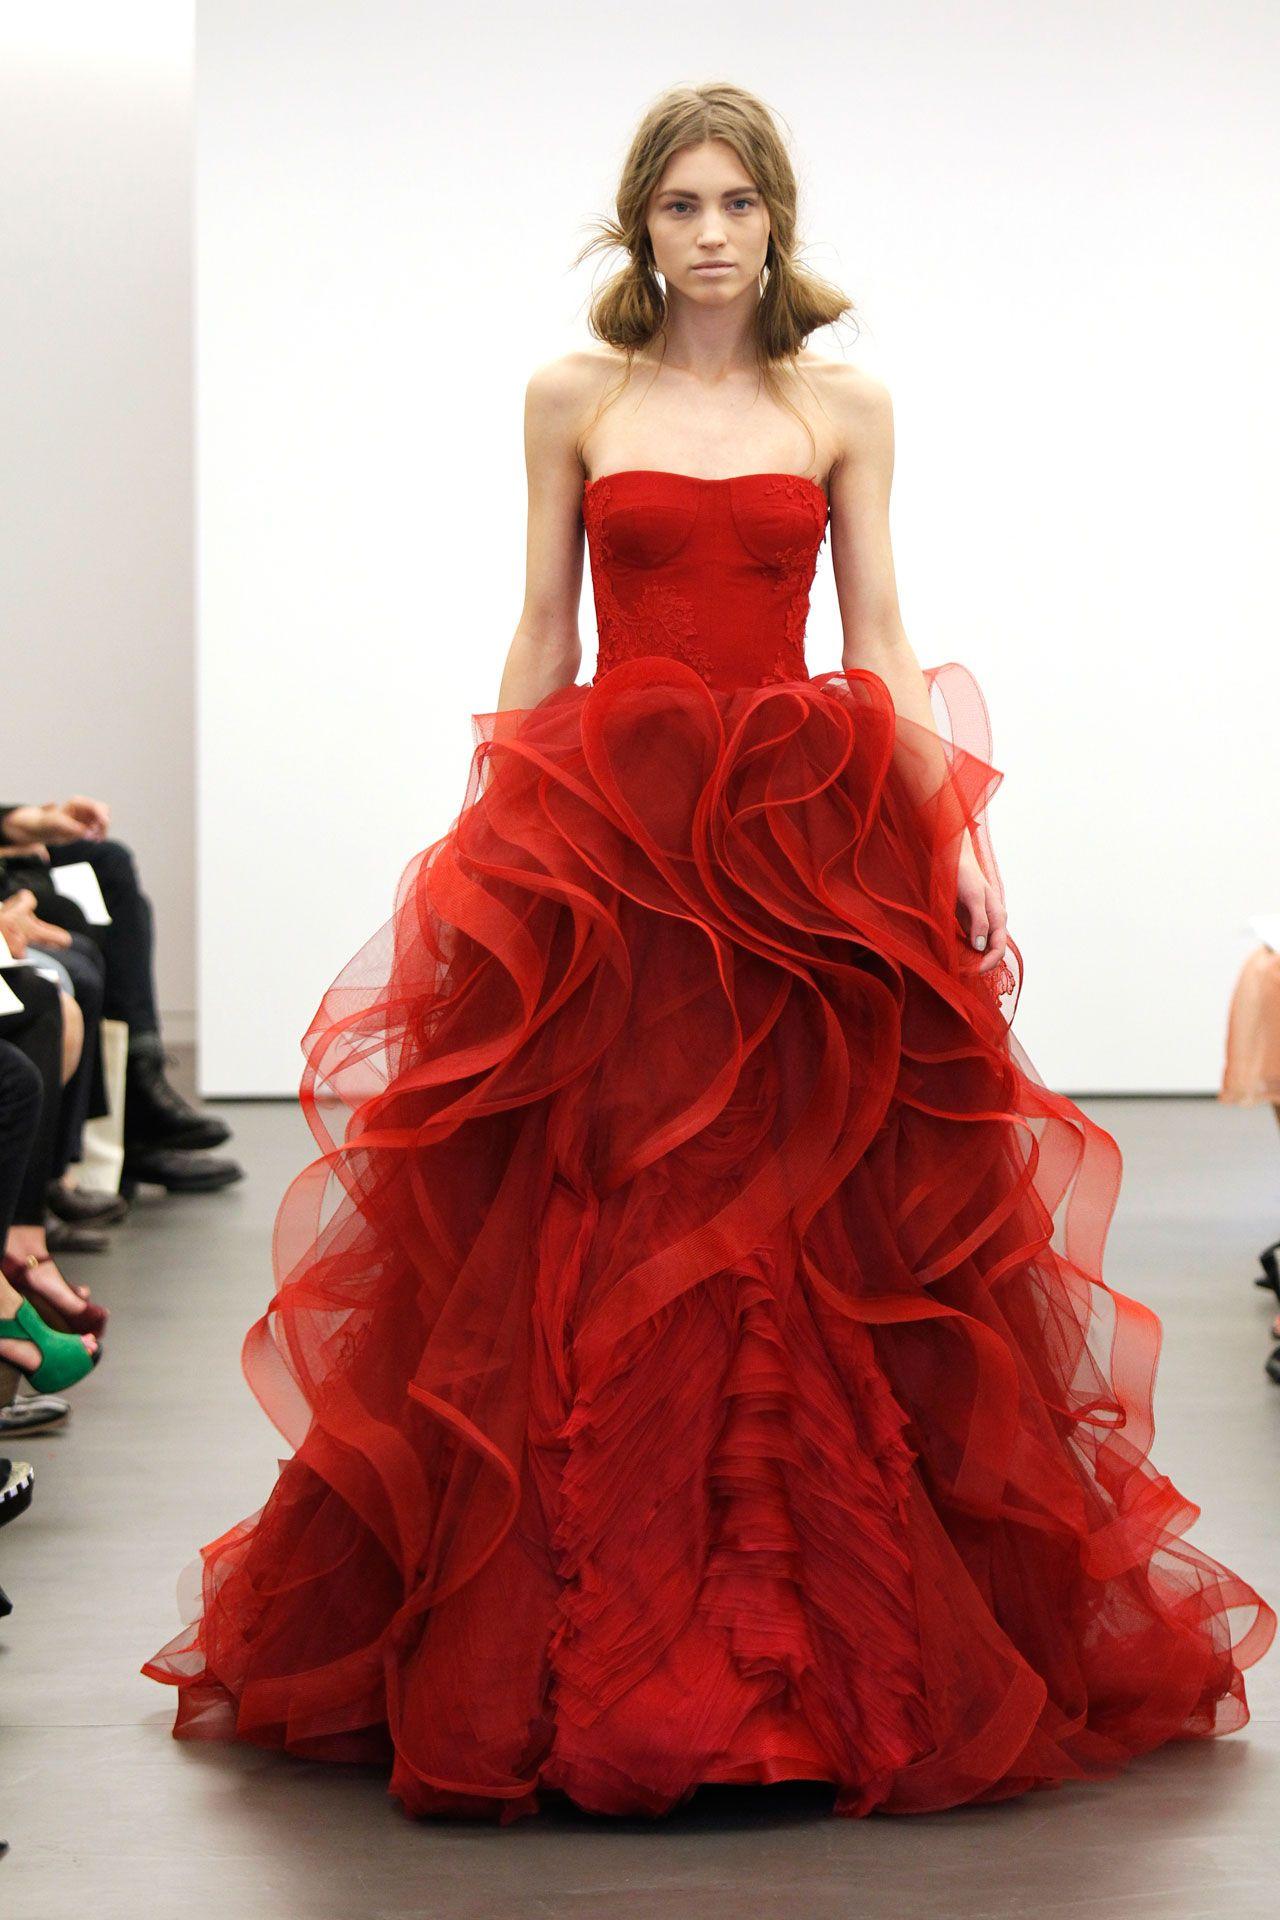 red dress for wedding Wedding Dresses The Ultimate Gallery BridesMagazine co uk